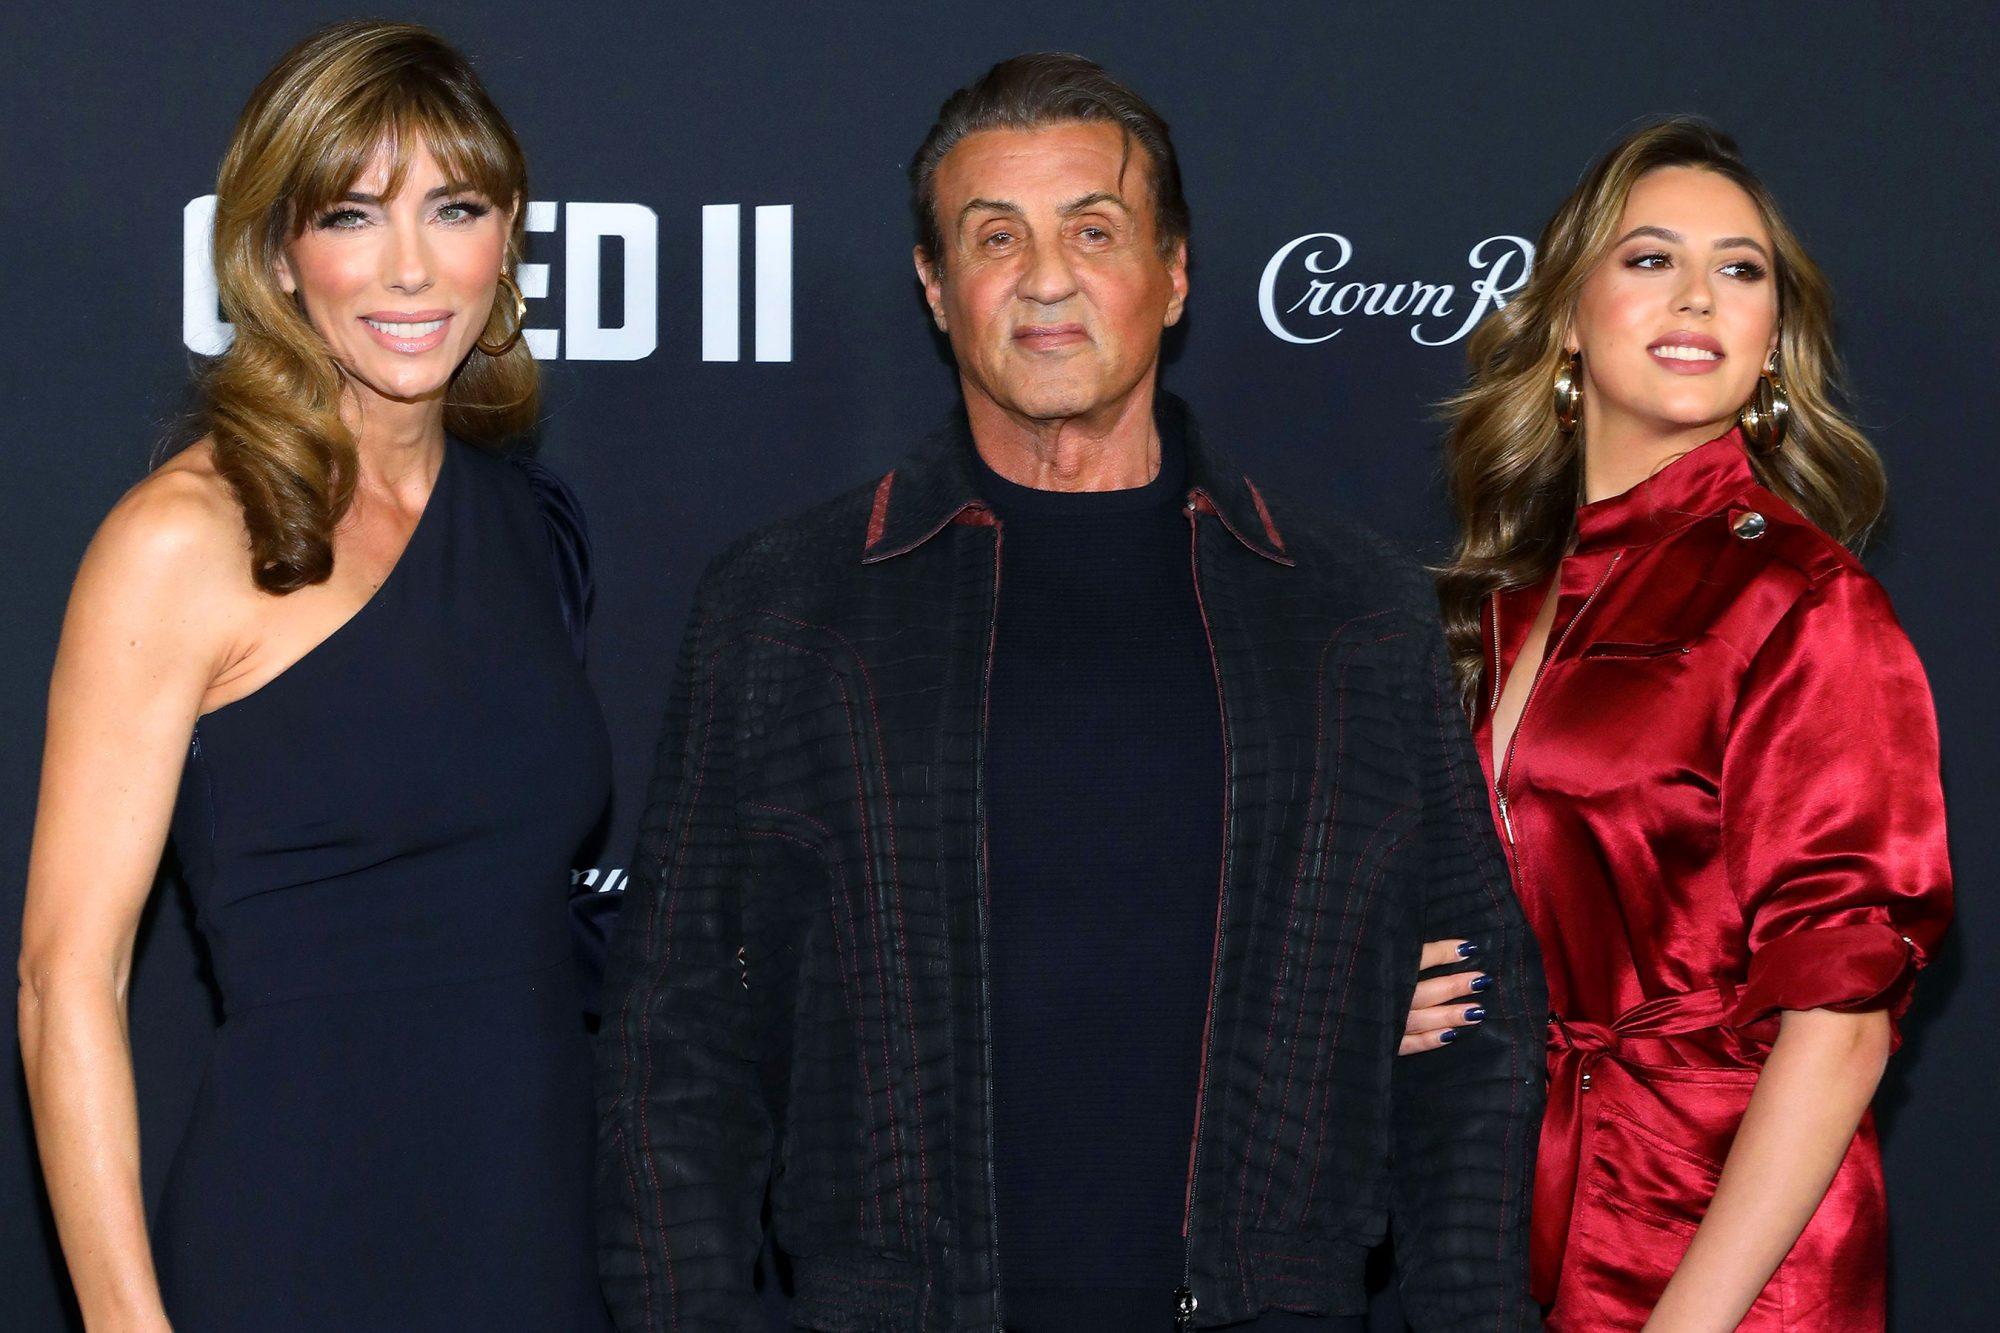 'Creed II' film premiere, Arrivals, New York, USA - 14 Nov 2018